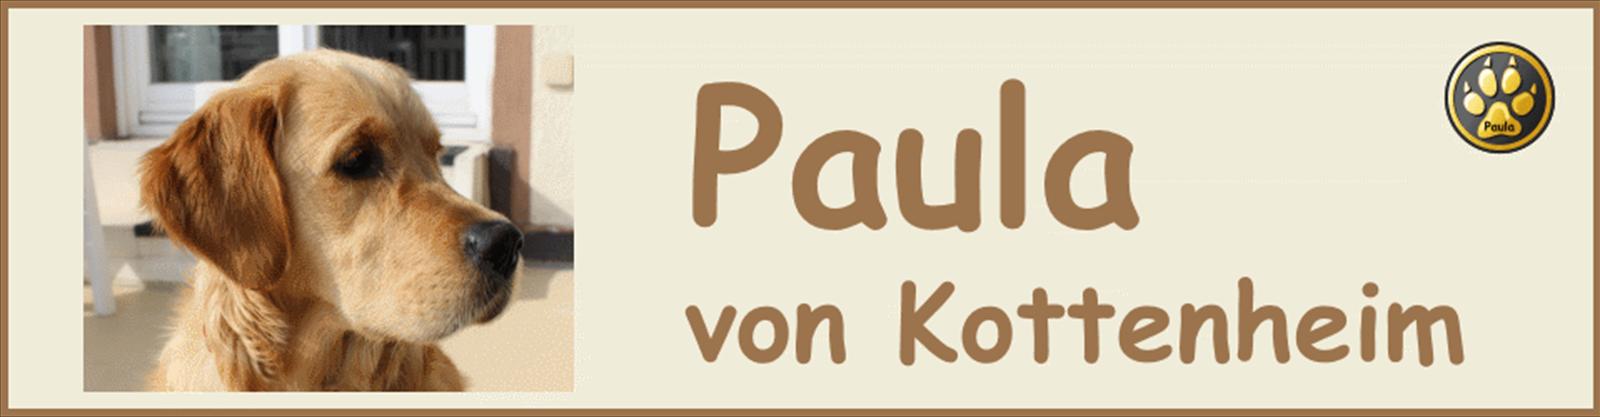 Paula-Banner-05